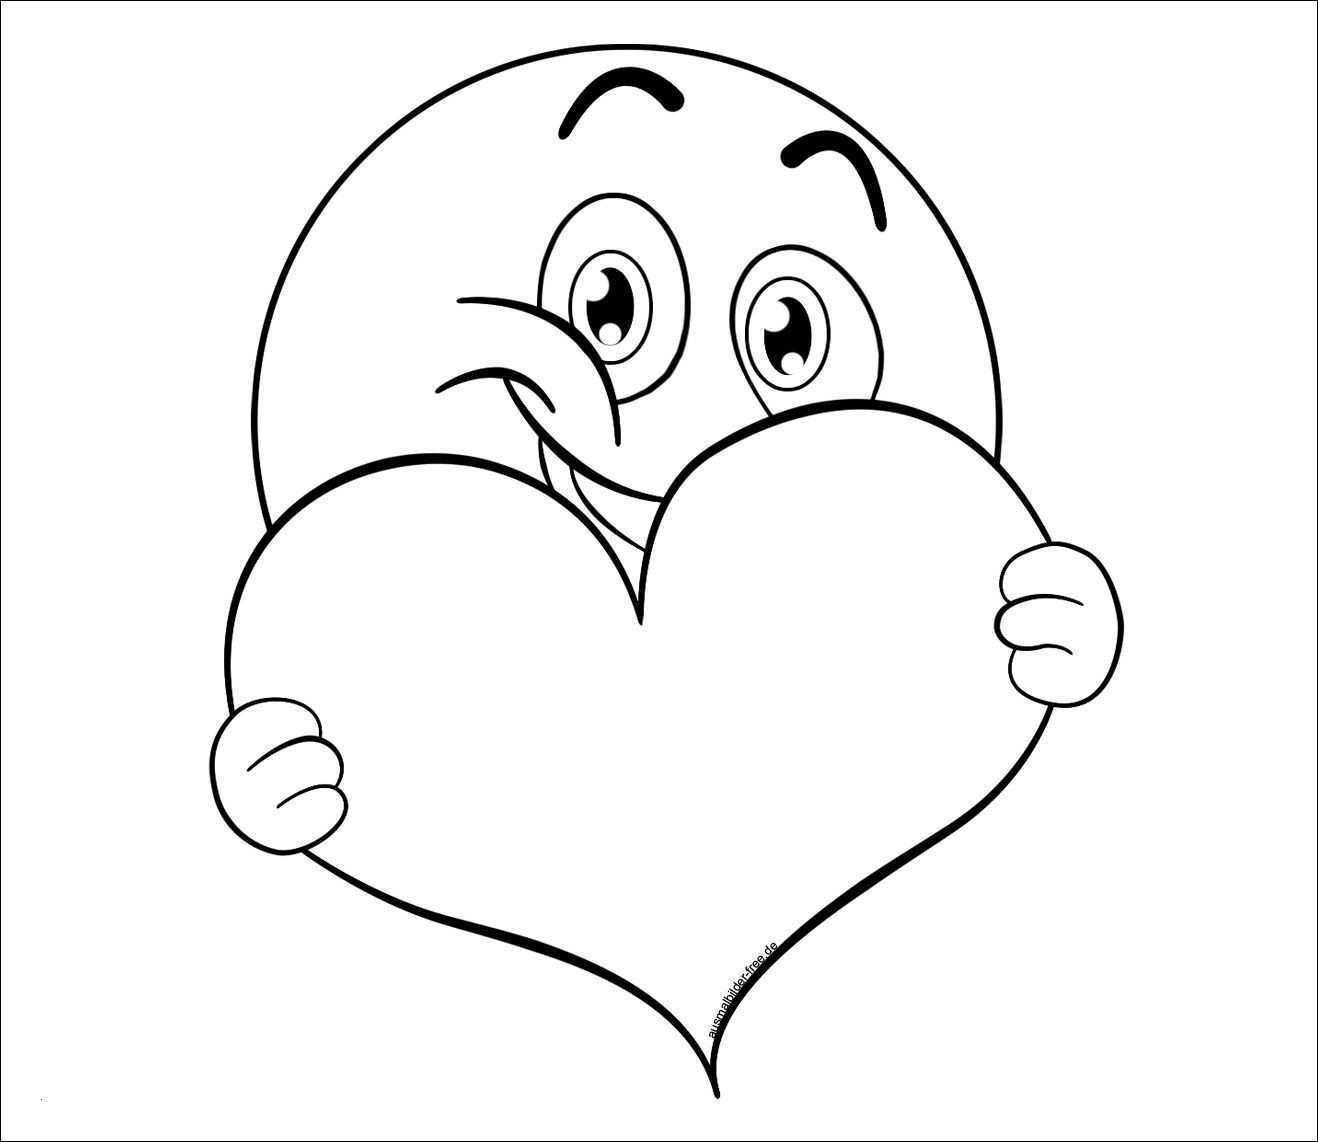 Mandala Zum Ausdrucken Rosen Neu Rose Herz Malvorlage Ideen Herz Malvorlagen Einfach Herz Mandalas Bilder